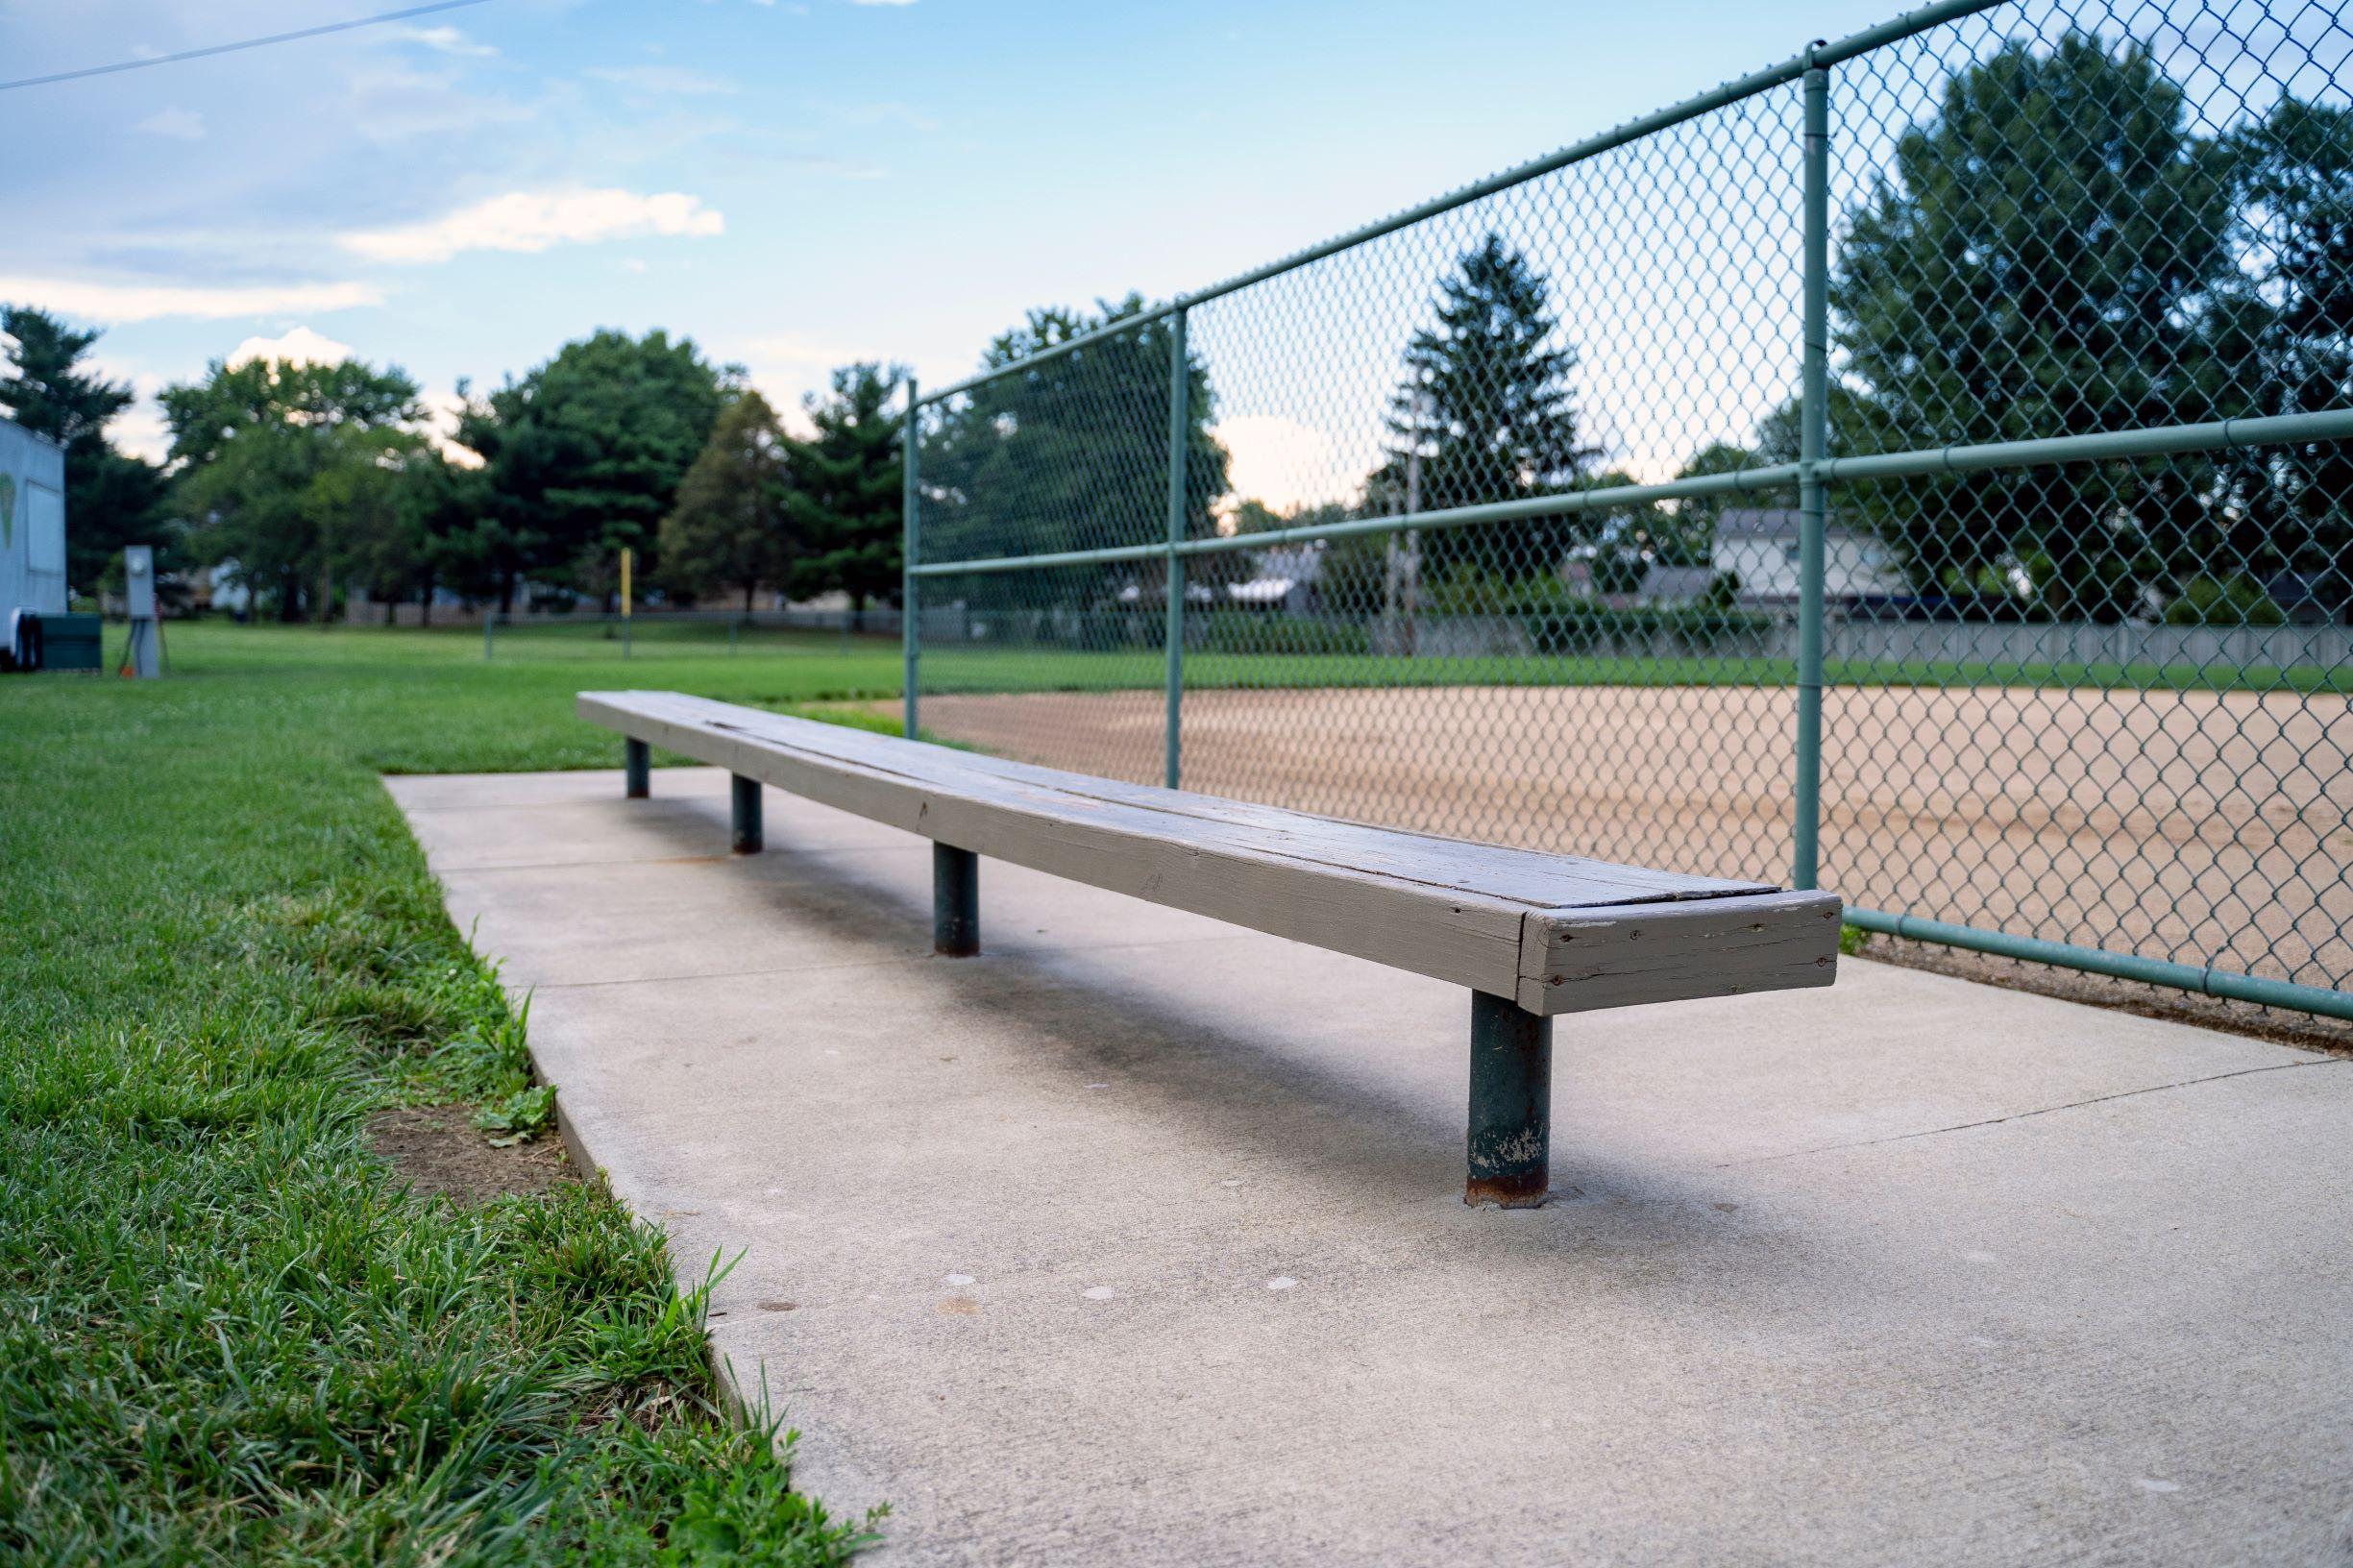 Empty Baseball Bench2